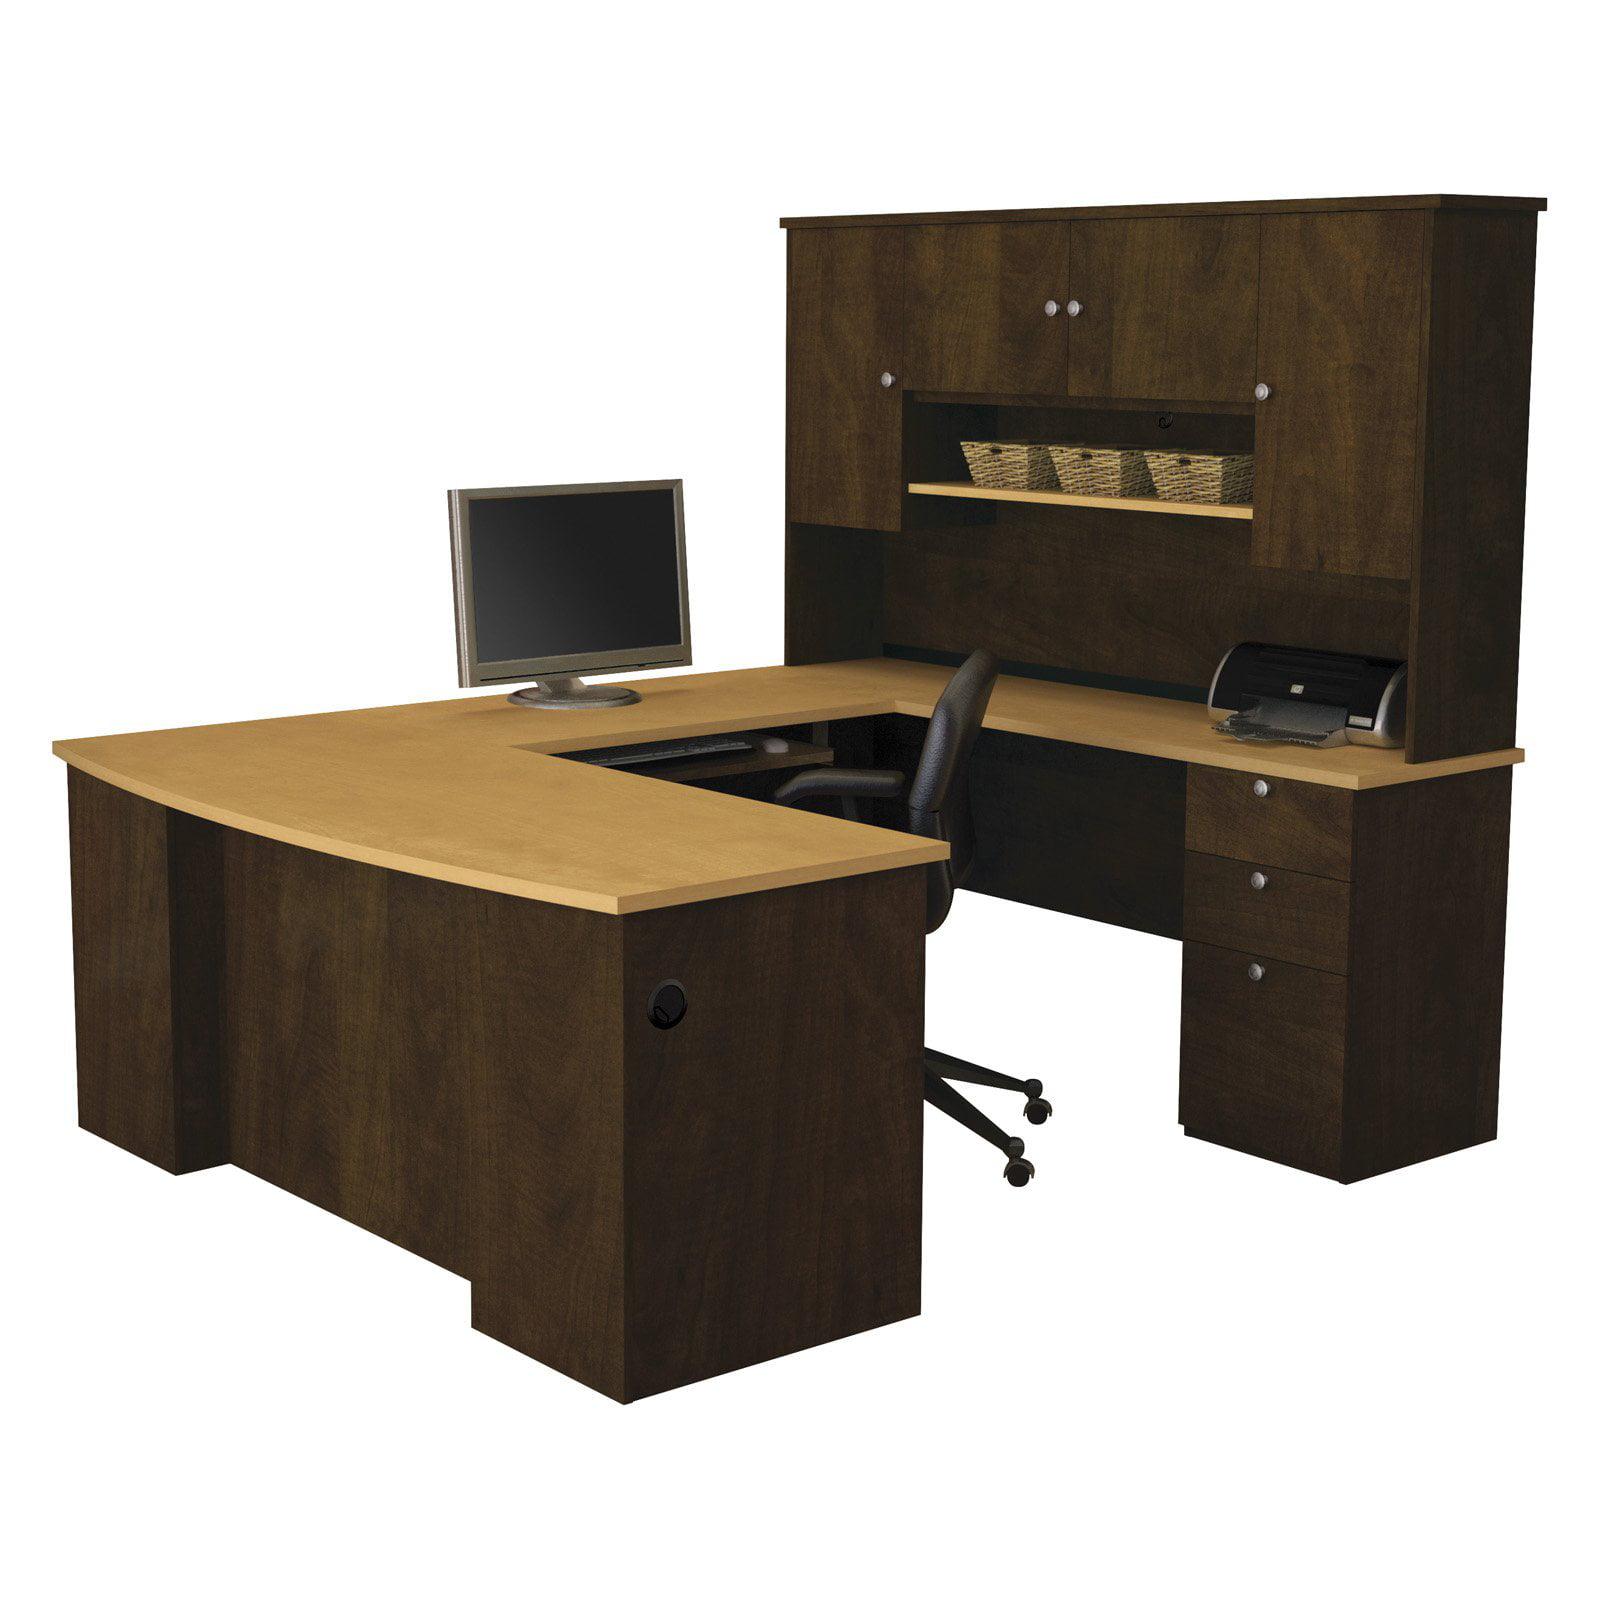 Bestar Manhattan U-shaped Workstation, Secret Maple and Chocolate